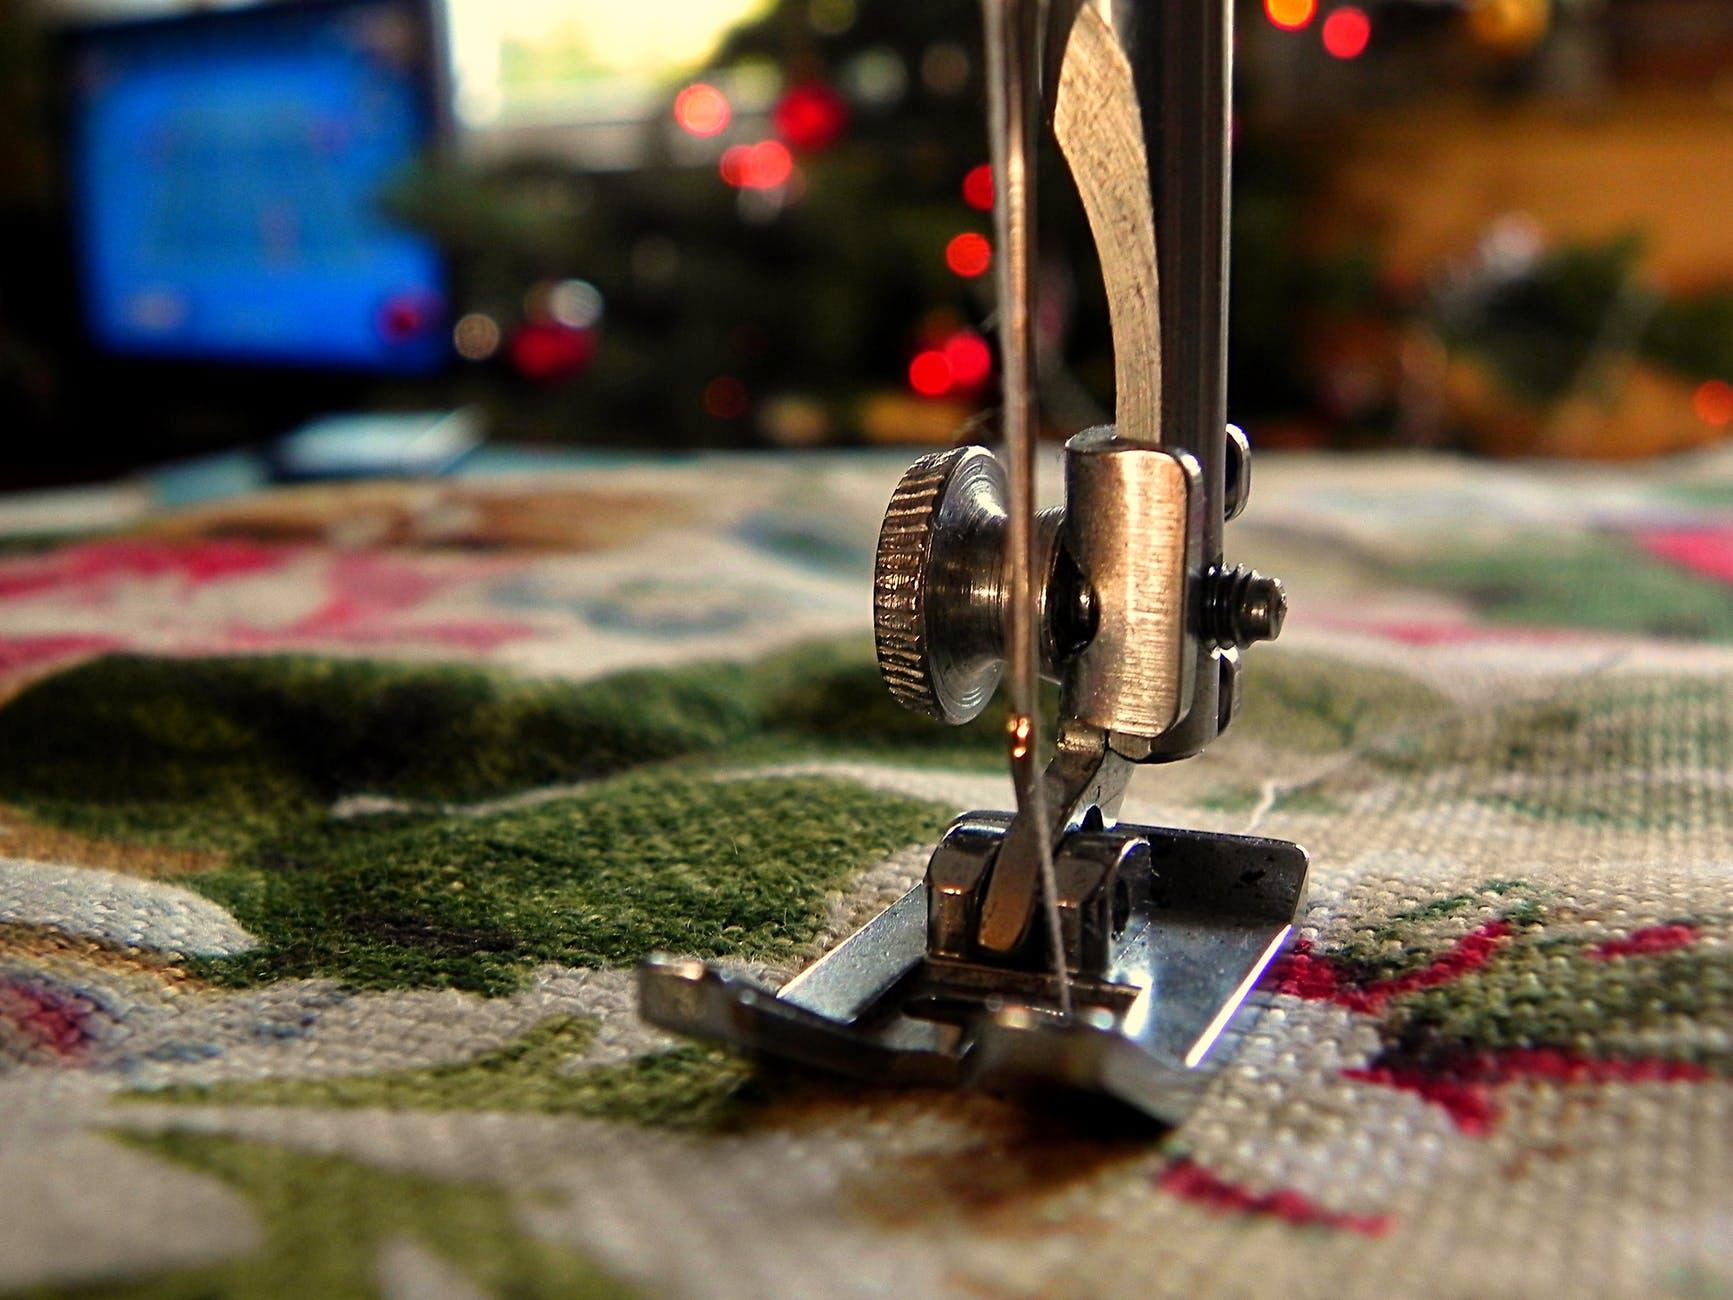 Entregan máquinas a 65 empresas del ramo textil en Aguascalientes